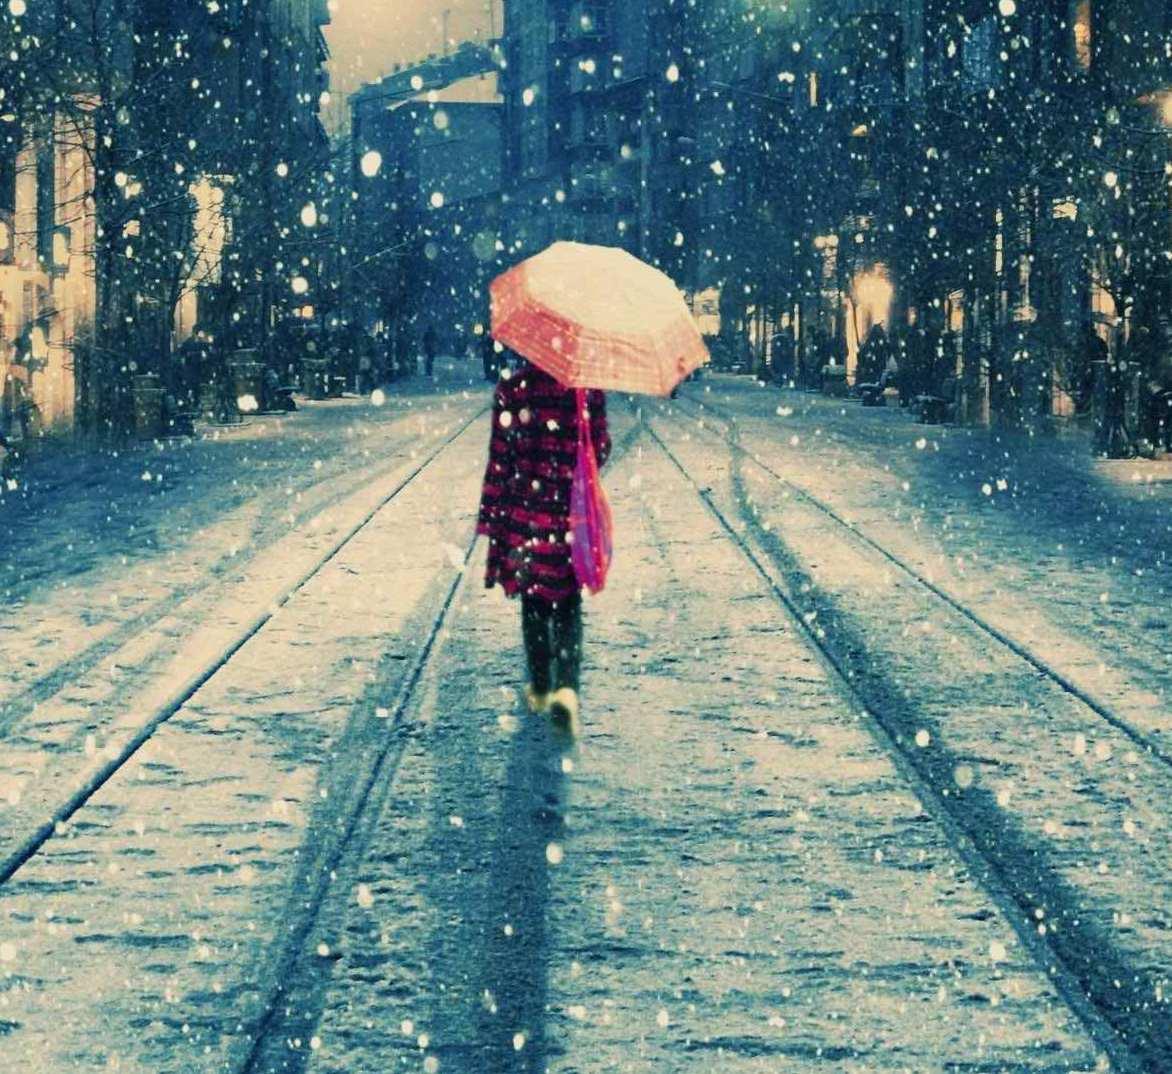 Gloomy Fall Wallpaper Girl In Rain Profile Dp For Whatsapp And Facebook